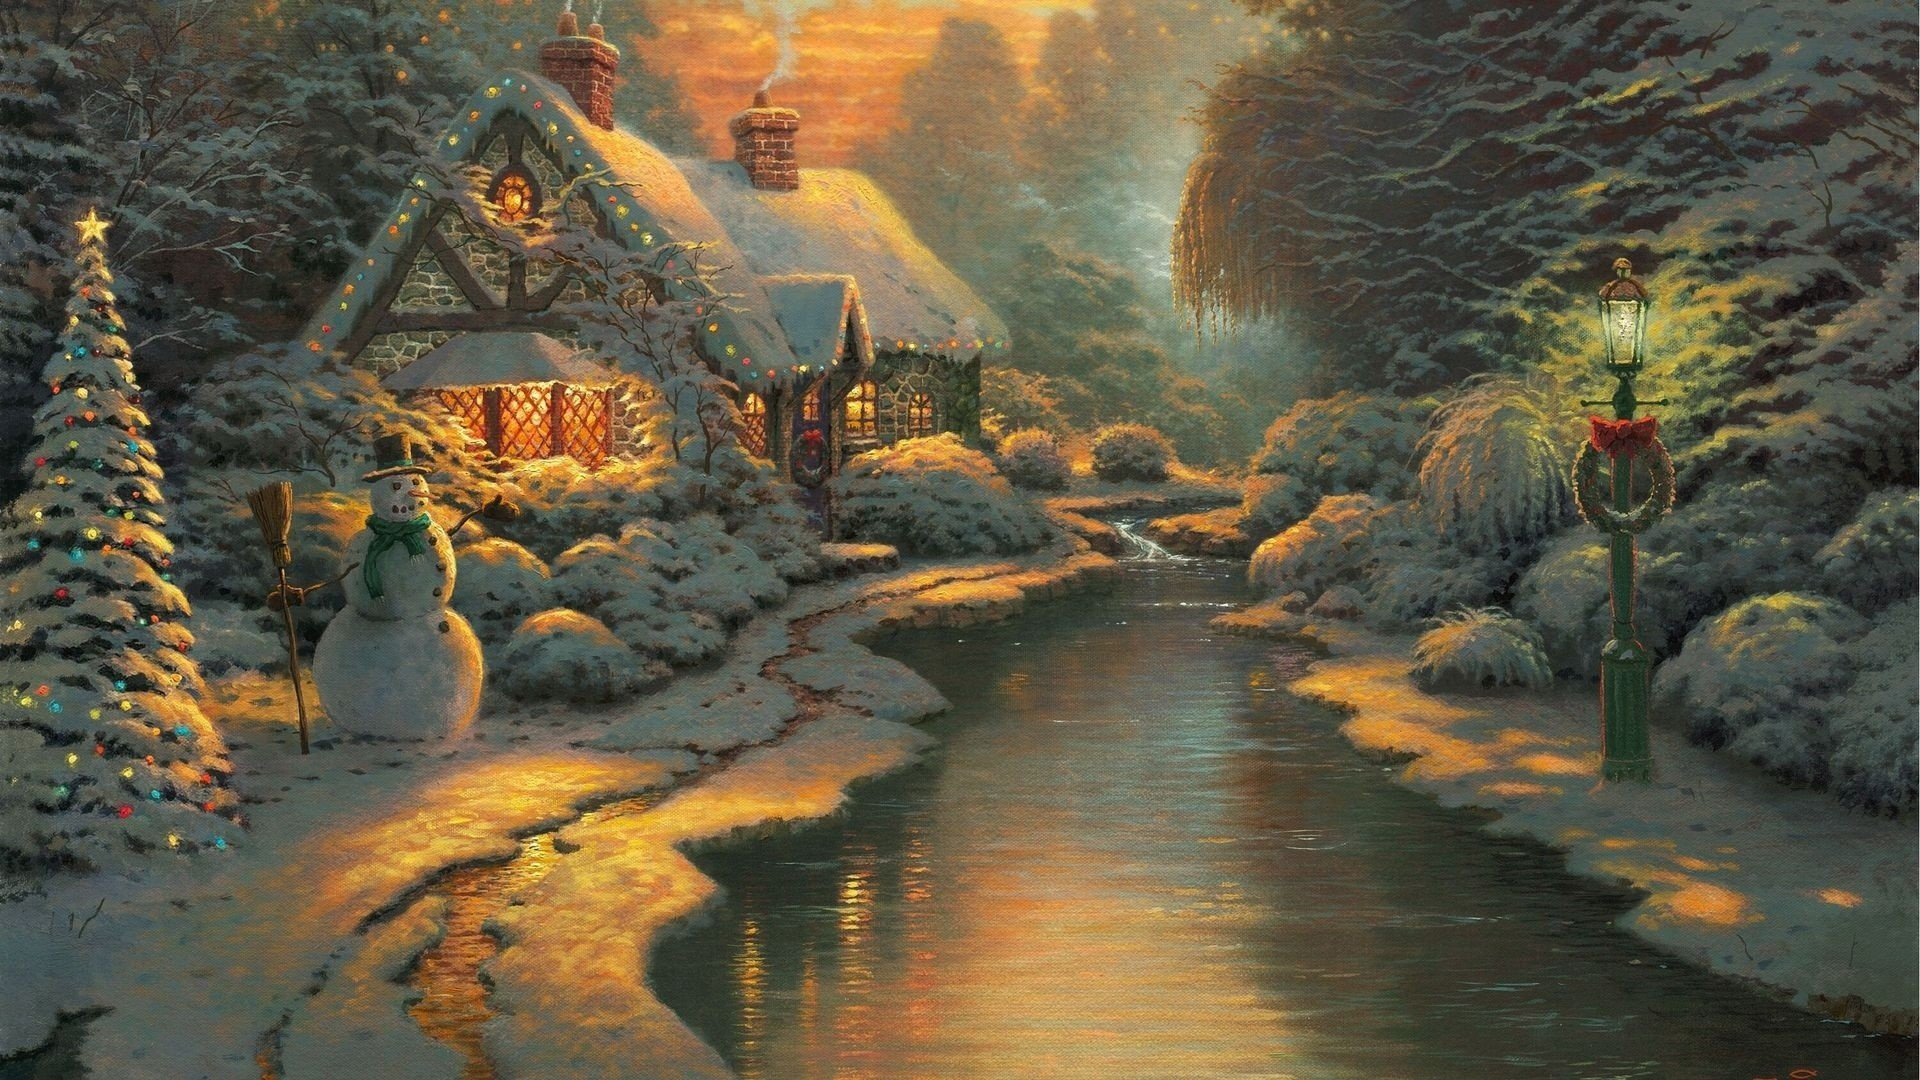 1920x1080 Thomas Kinkade Disney Wallpapers - Wallpaper Cave ... Download · Wide .